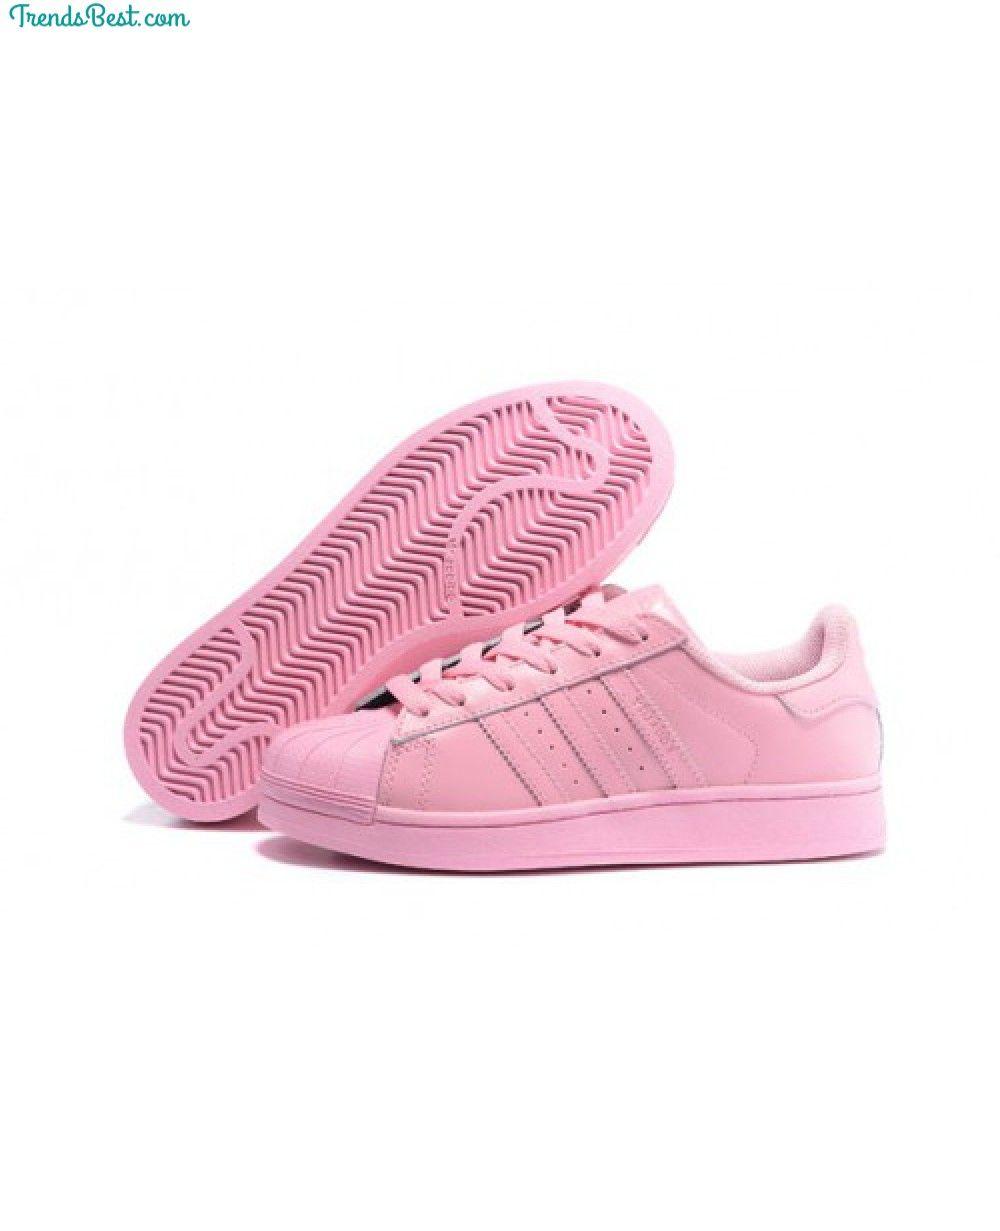 adidas originals superstar womens pink and white